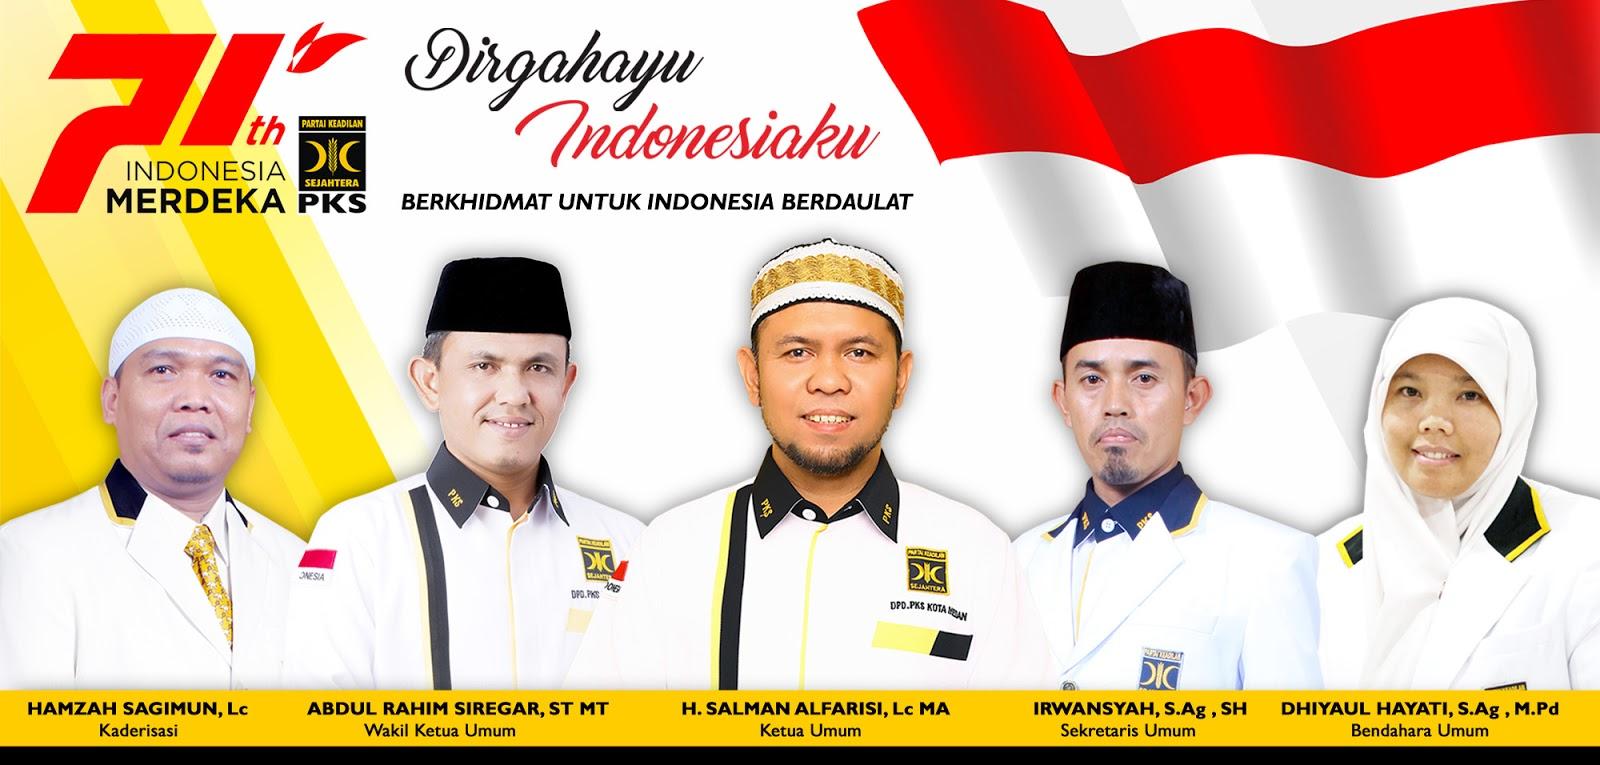 Selamat Hari Ulang Tahun Republik Indonesia yang ke-71